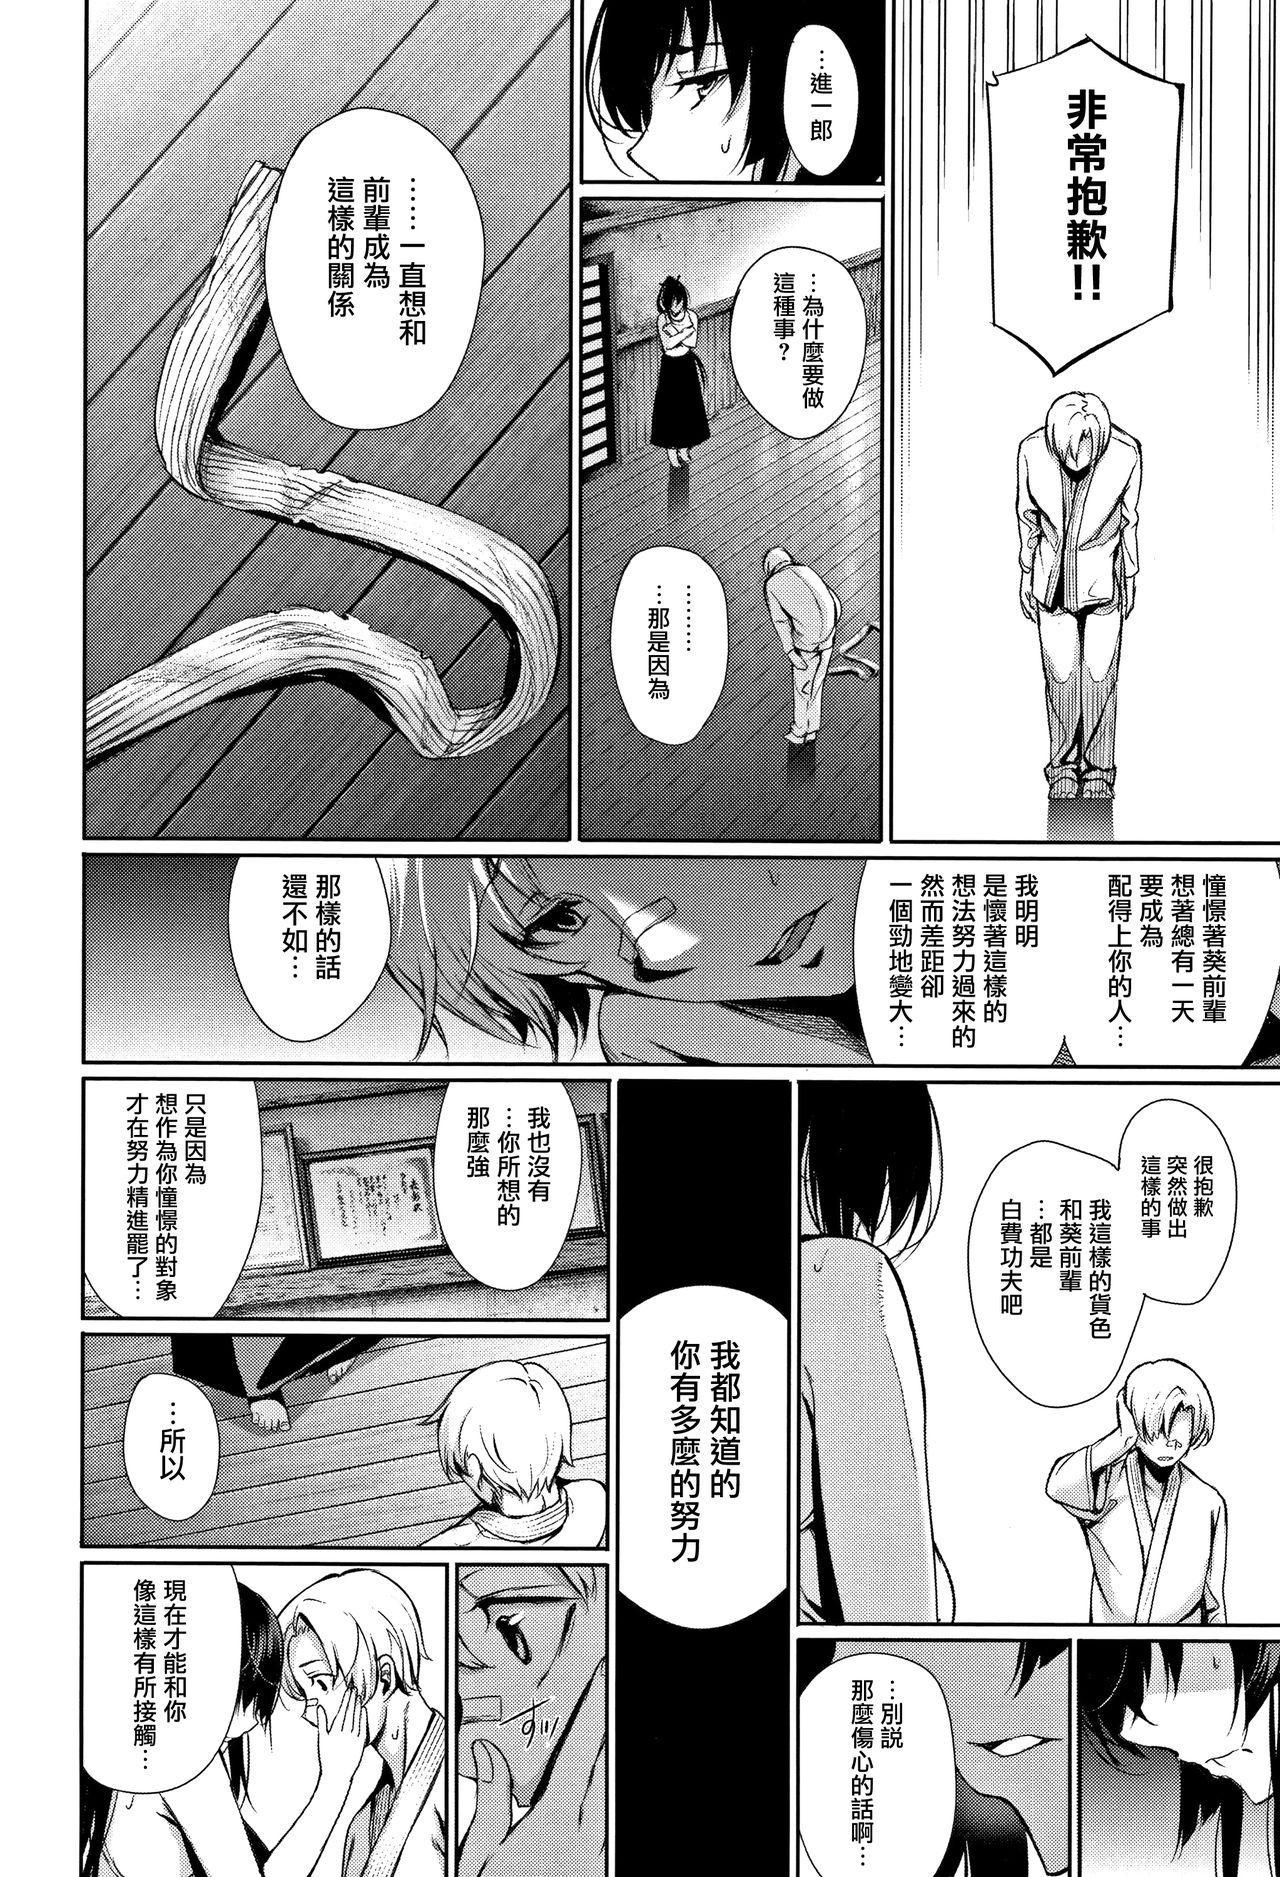 [Gentsuki] Kimi Omou Koi - I think of you. Ch. 1-4 [Chinese] [无毒汉化组] 16